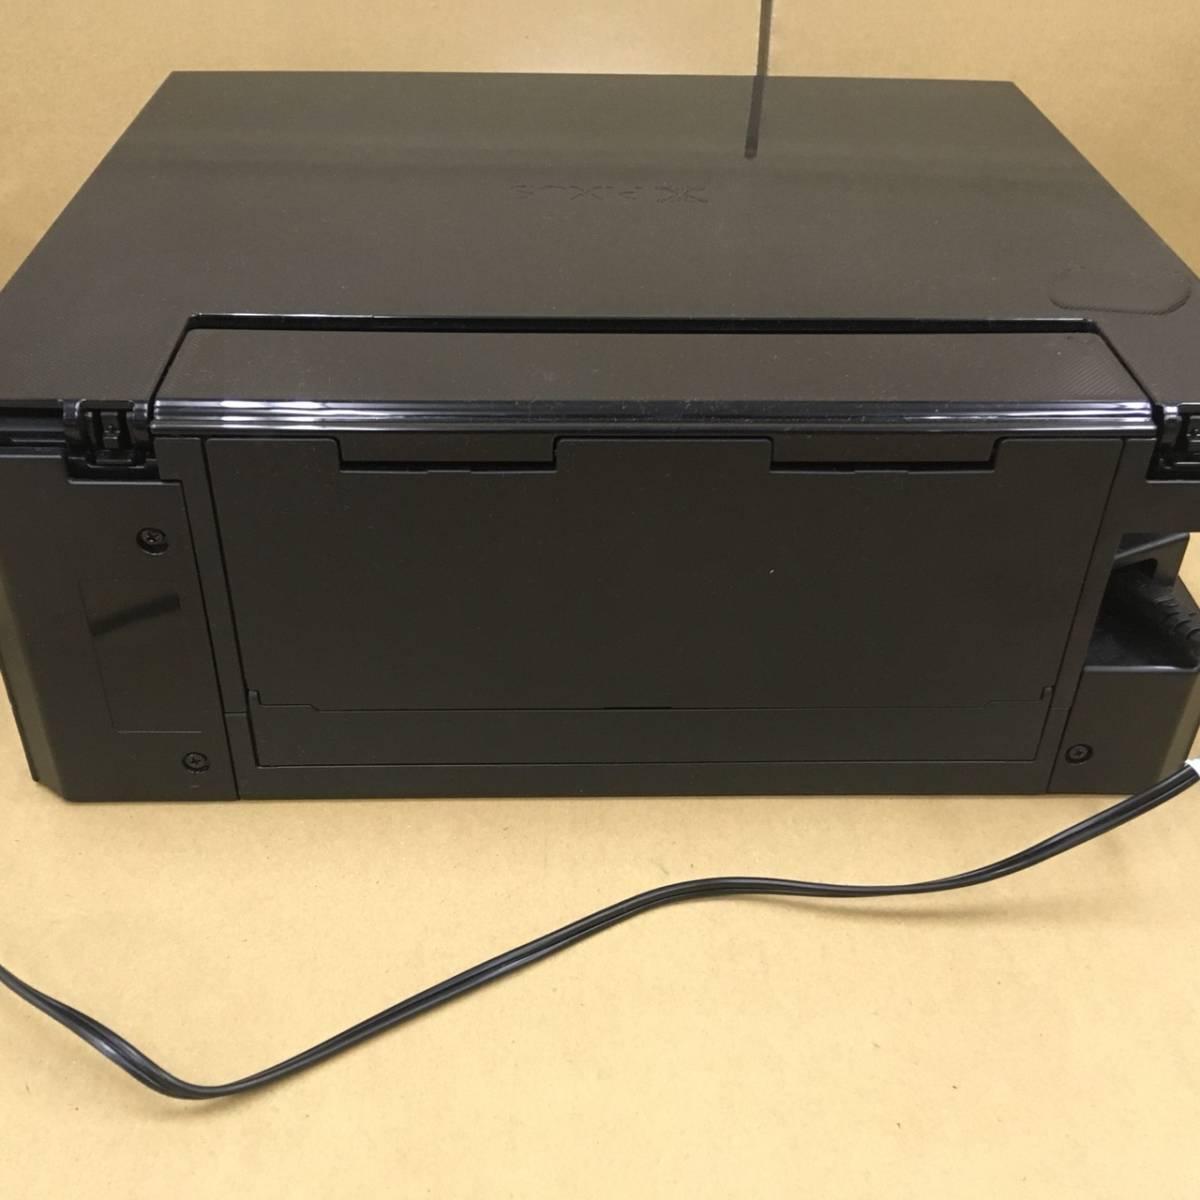 A15b01D Canon PIXUS TS8230 インクジェットプリンター キャノン 印刷機_画像10